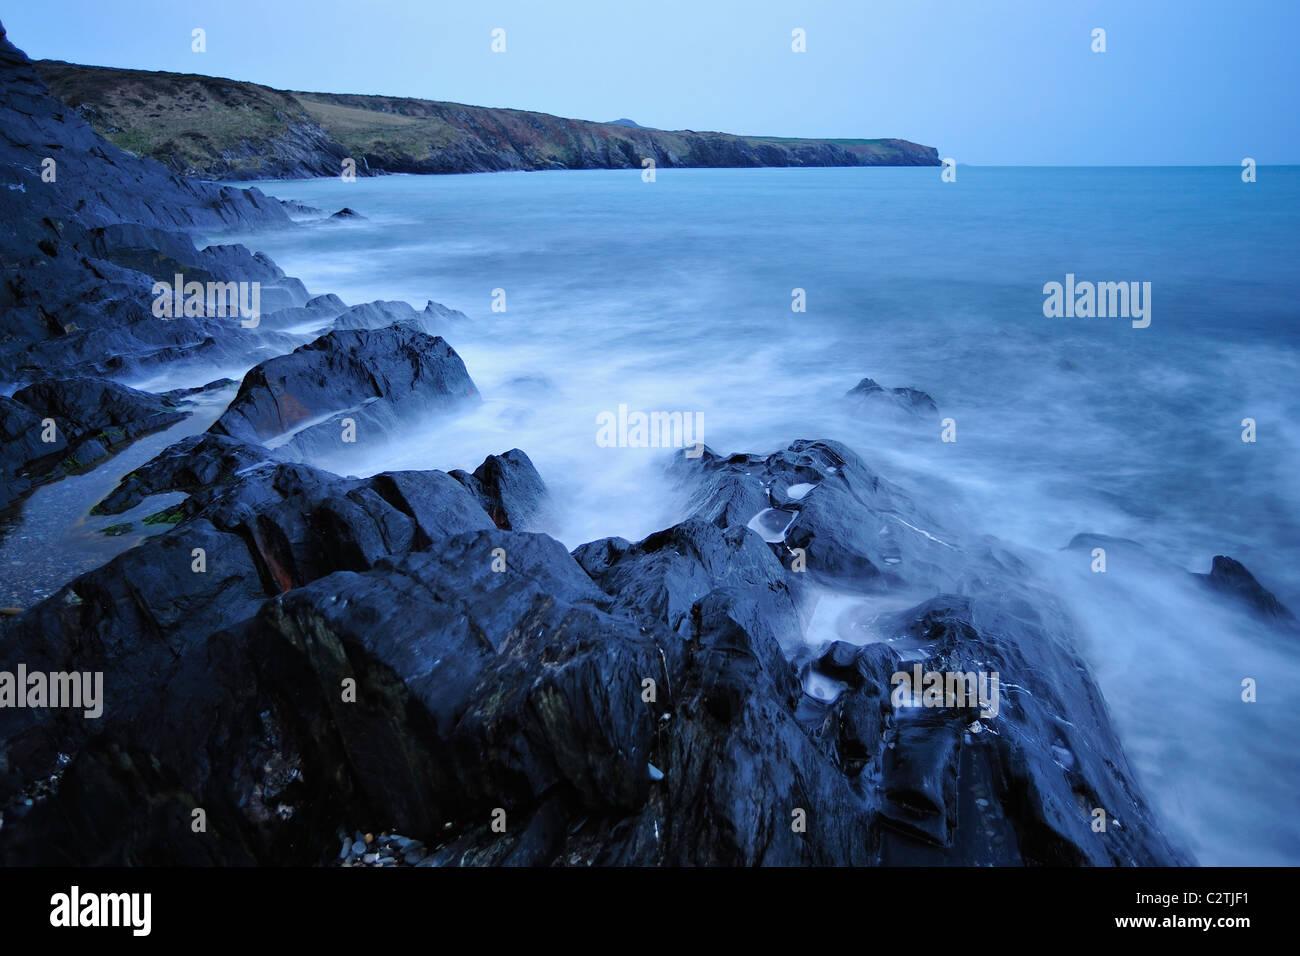 Porthgain on the Pembrokeshire coast - Stock Image